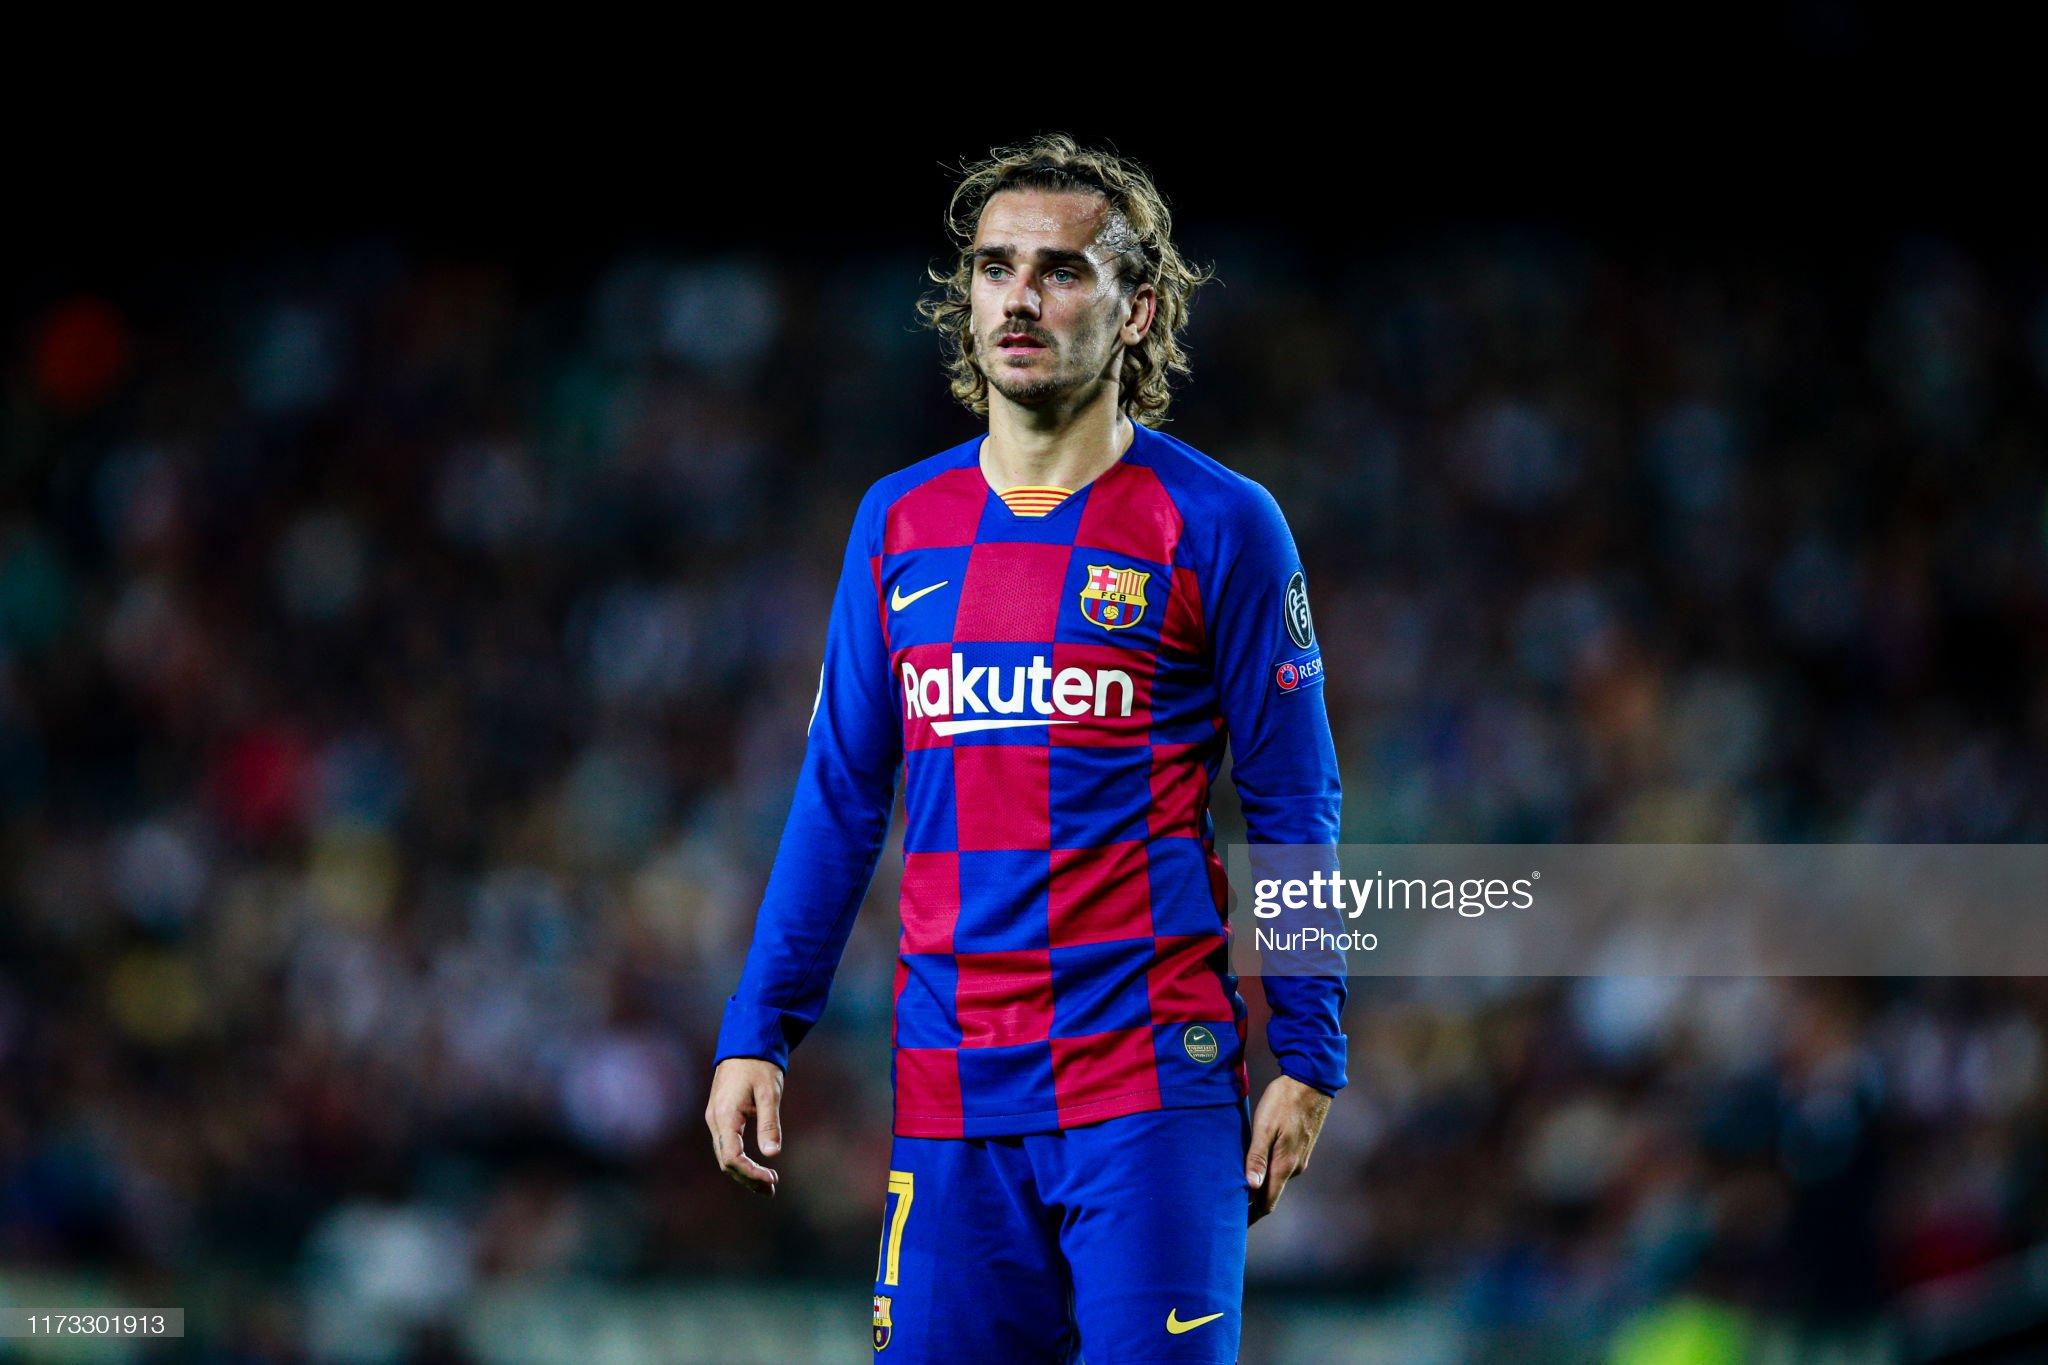 صور مباراة : برشلونة - إنتر 2-1 ( 02-10-2019 )  Antoine-griezmann-from-france-of-fc-barcelona-during-the-uefa-league-picture-id1173301913?s=2048x2048